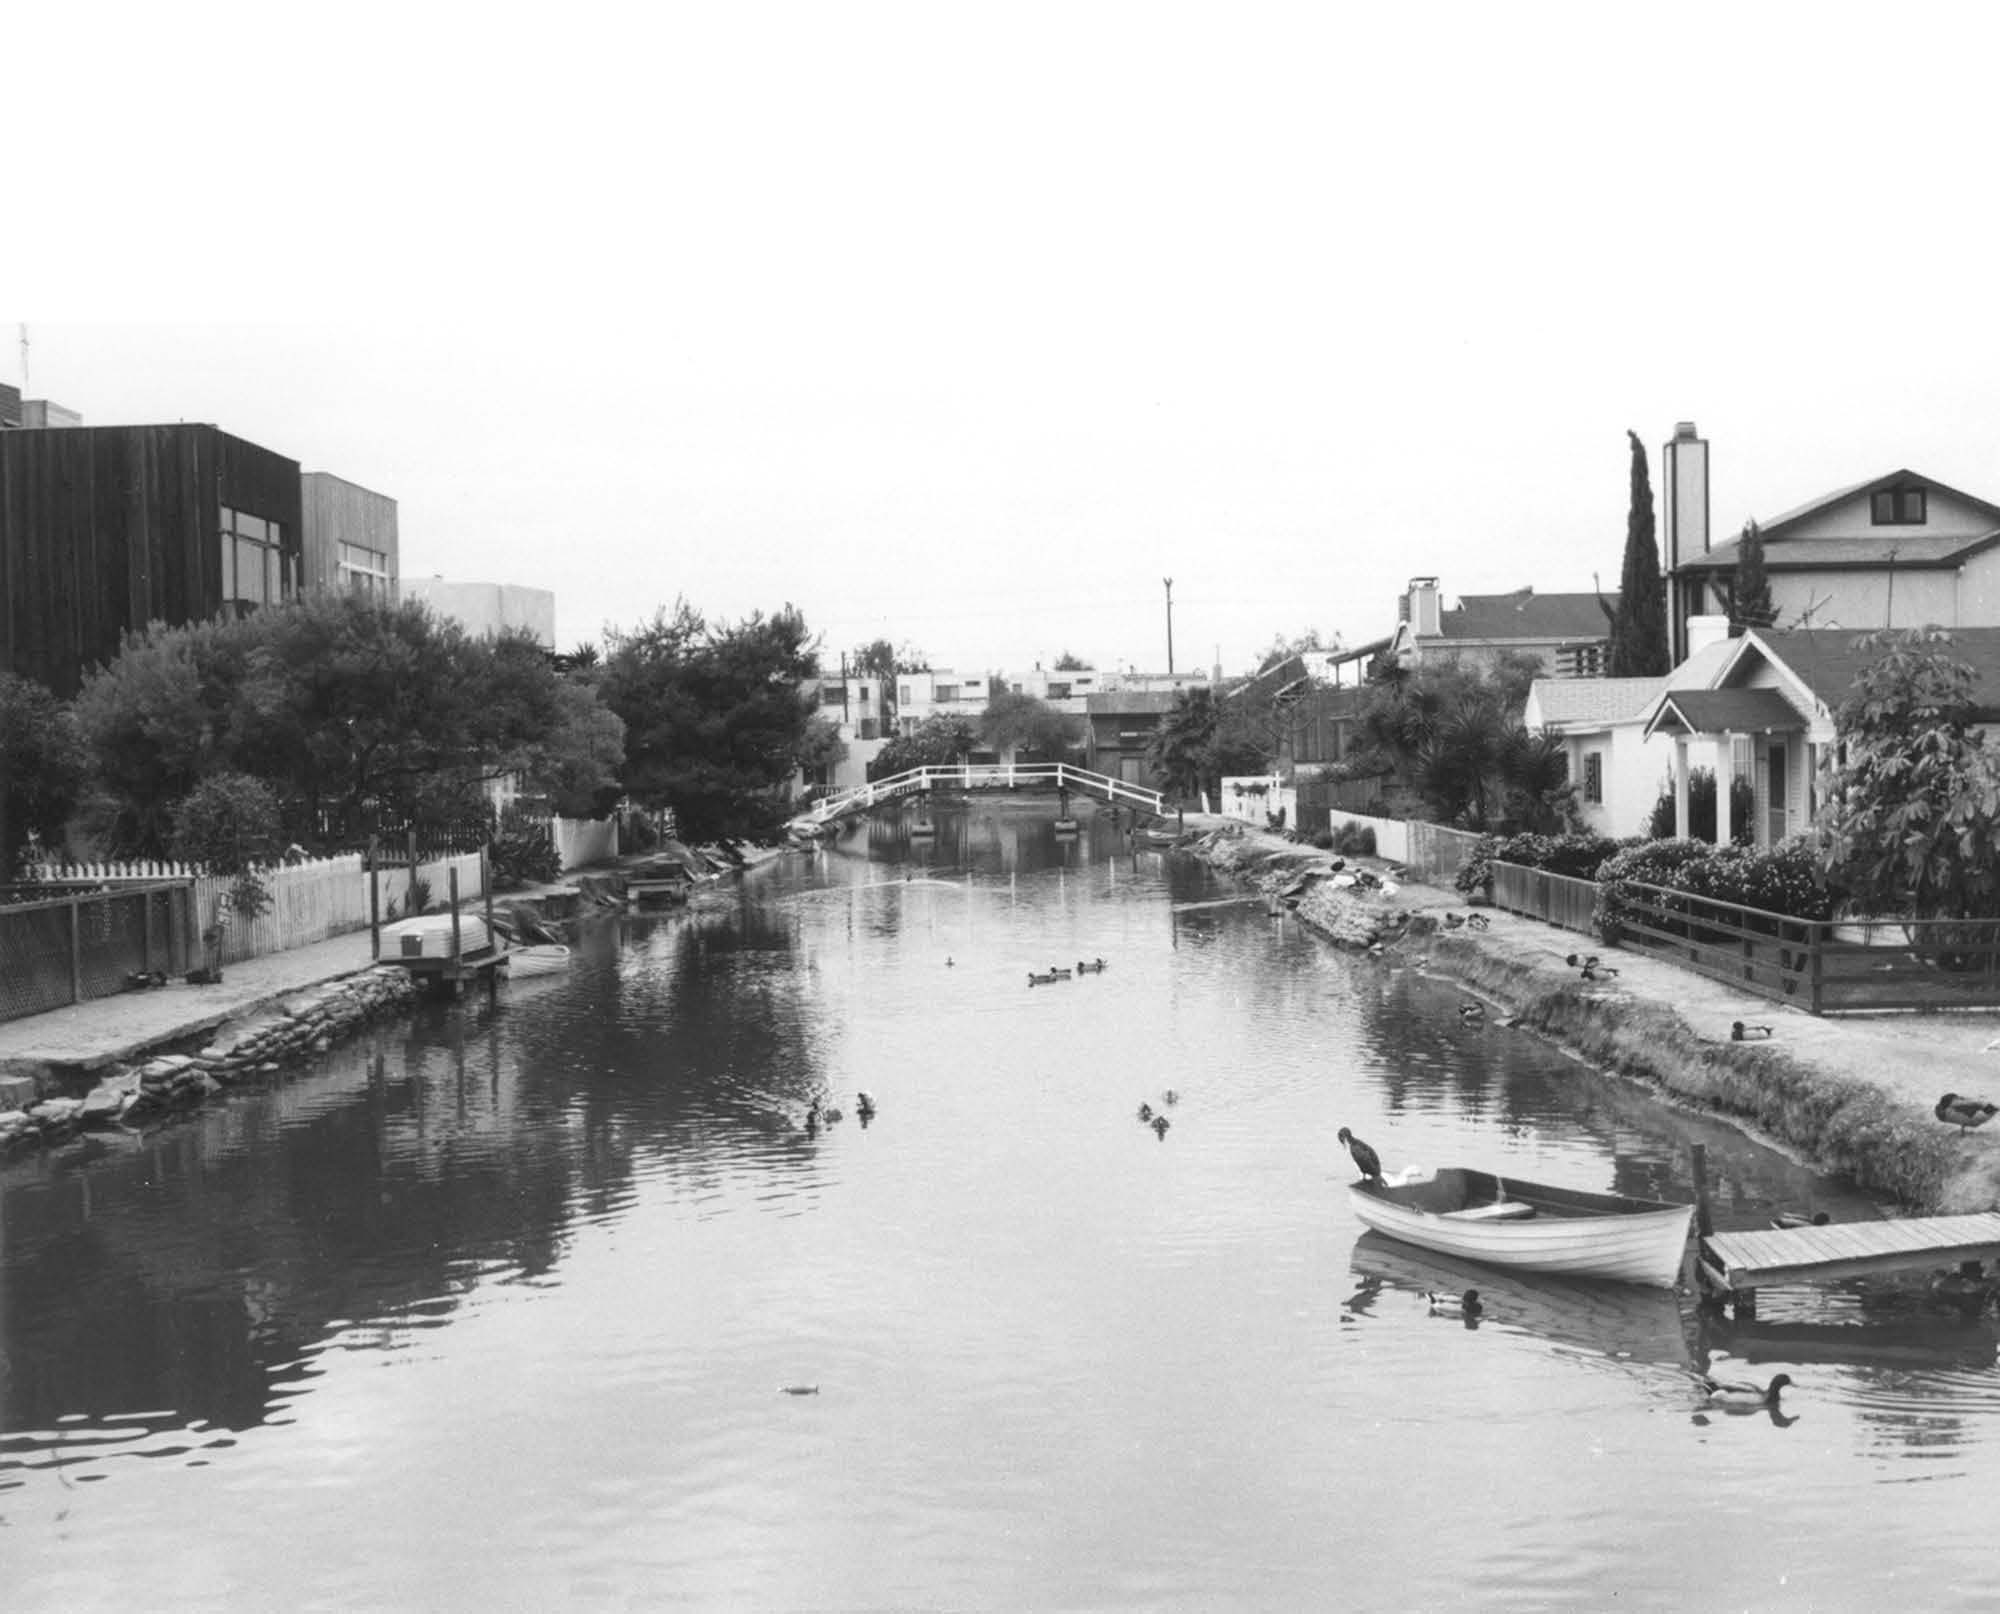 Venice Canal System - PHOTO